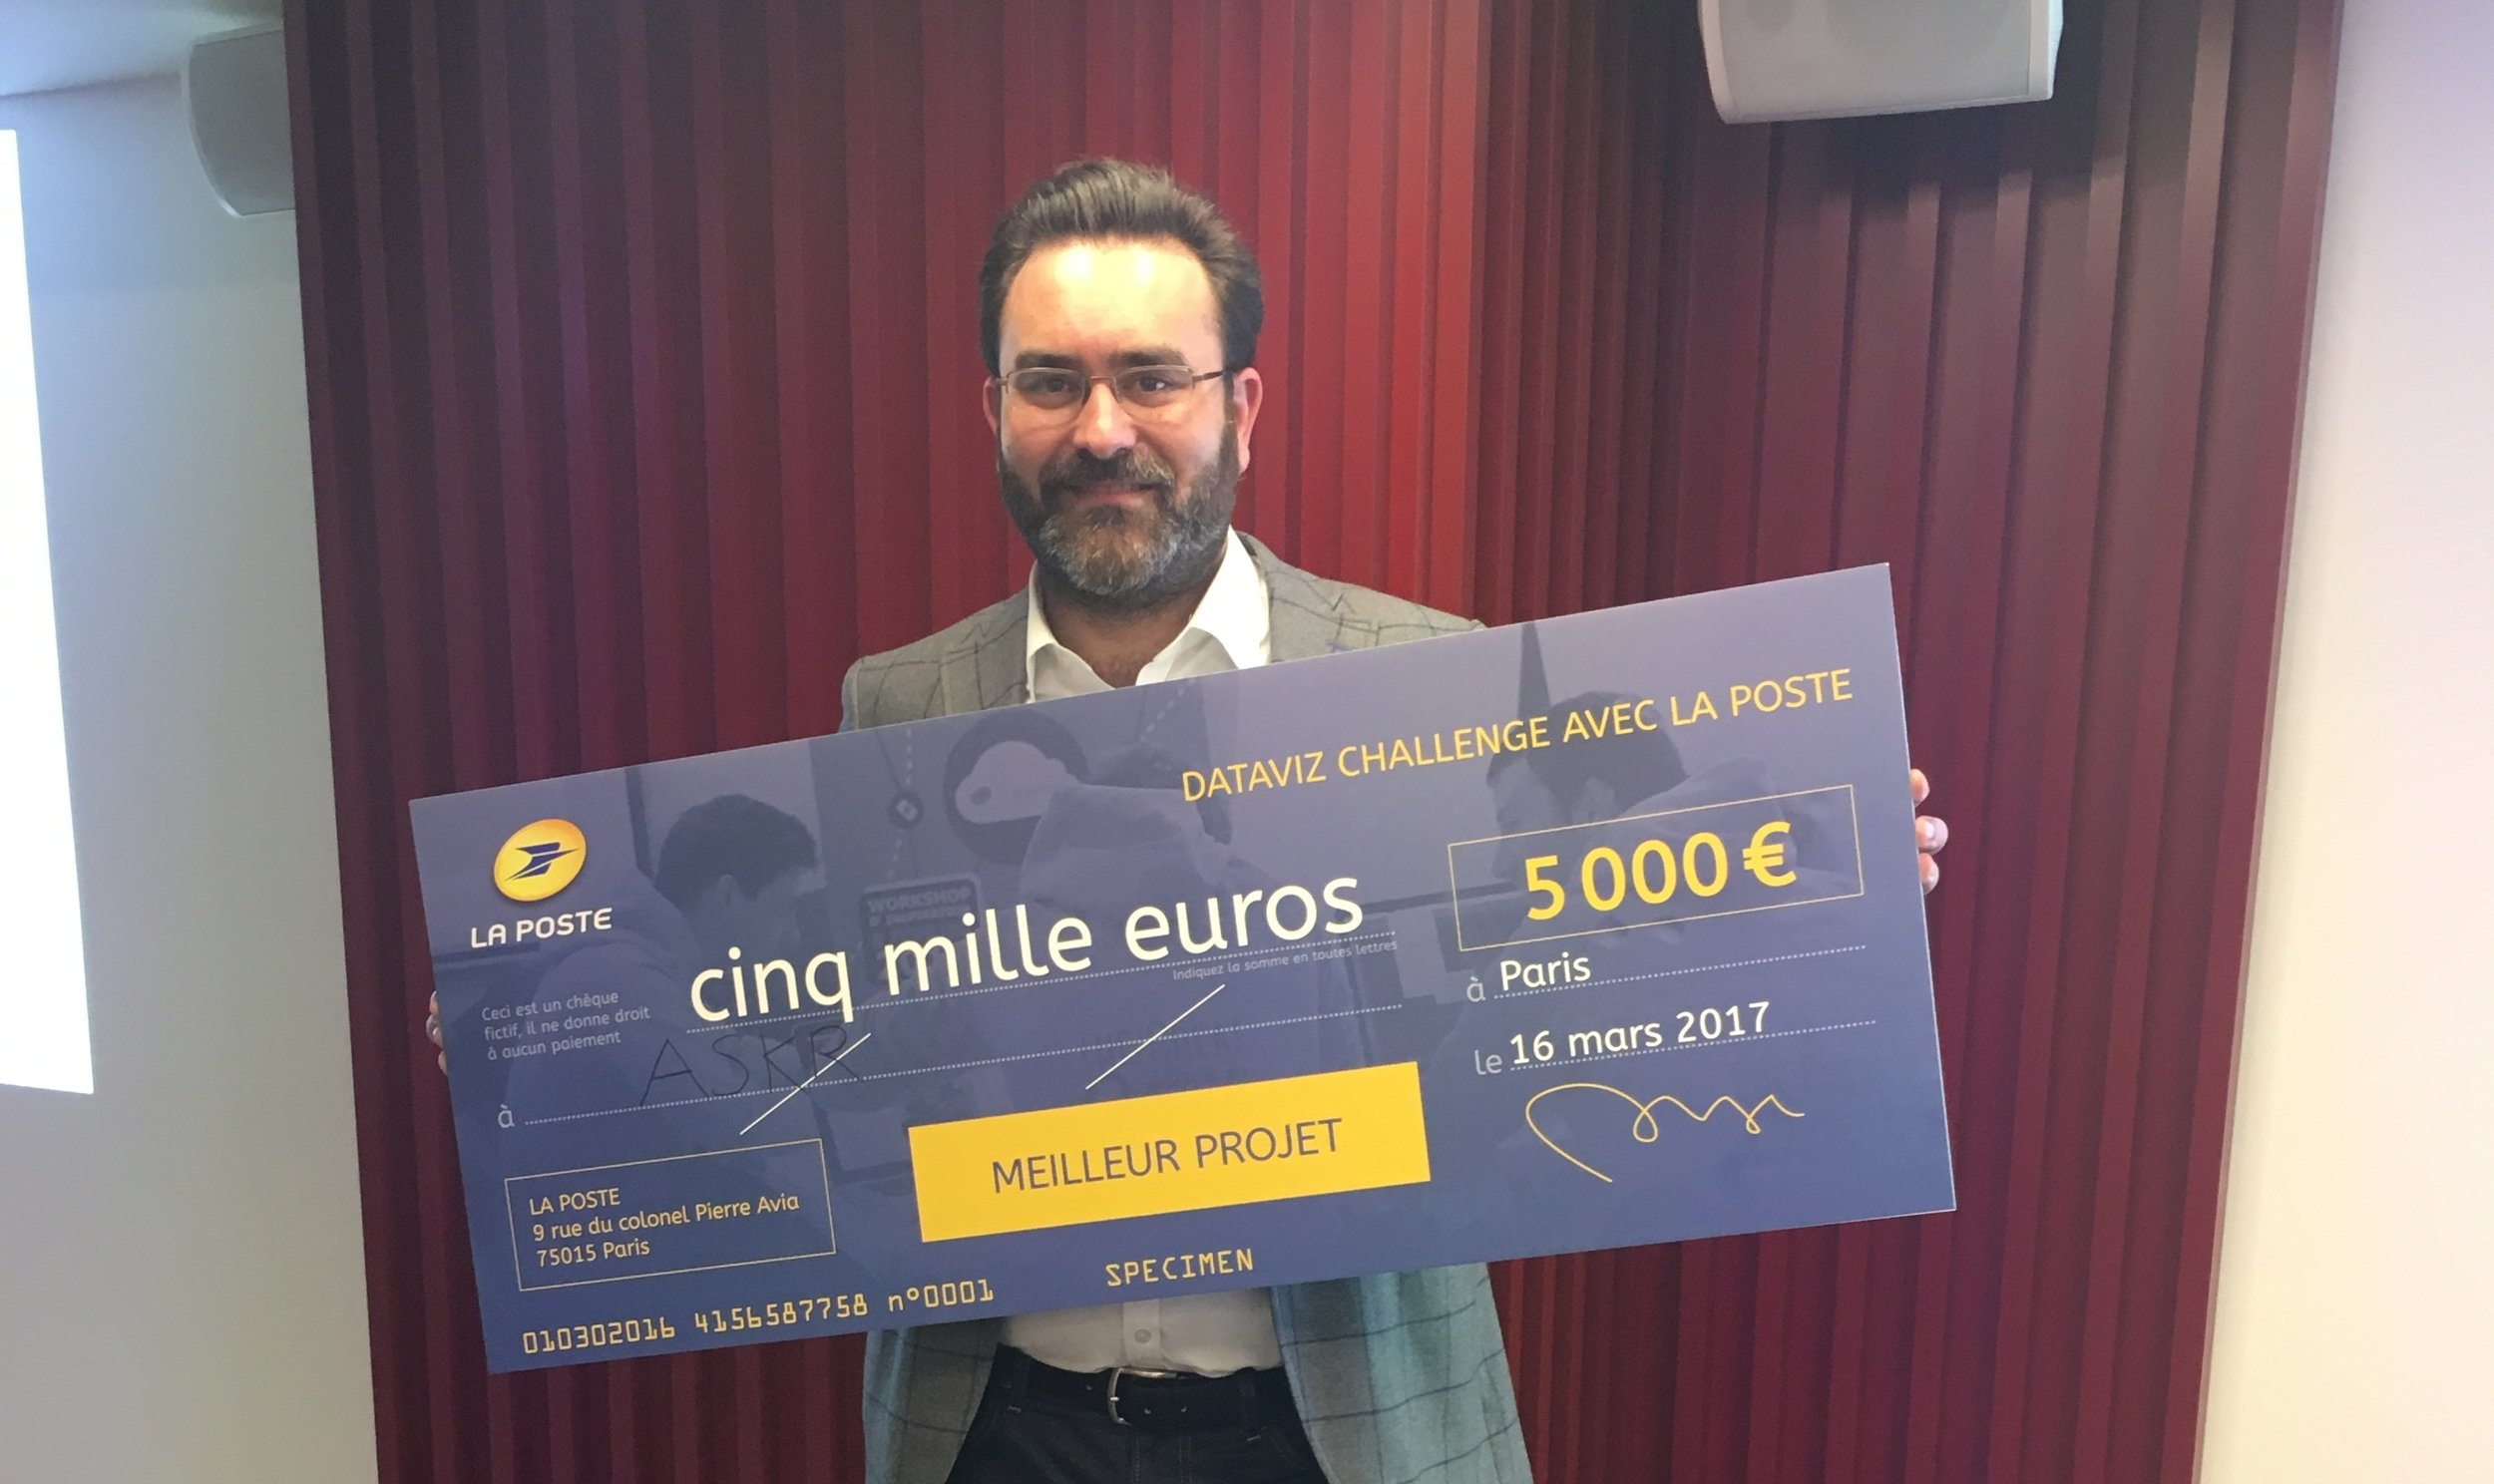 Matthieu Chabeau, CEO d'AskR, holding the DatavIz Challenge price.